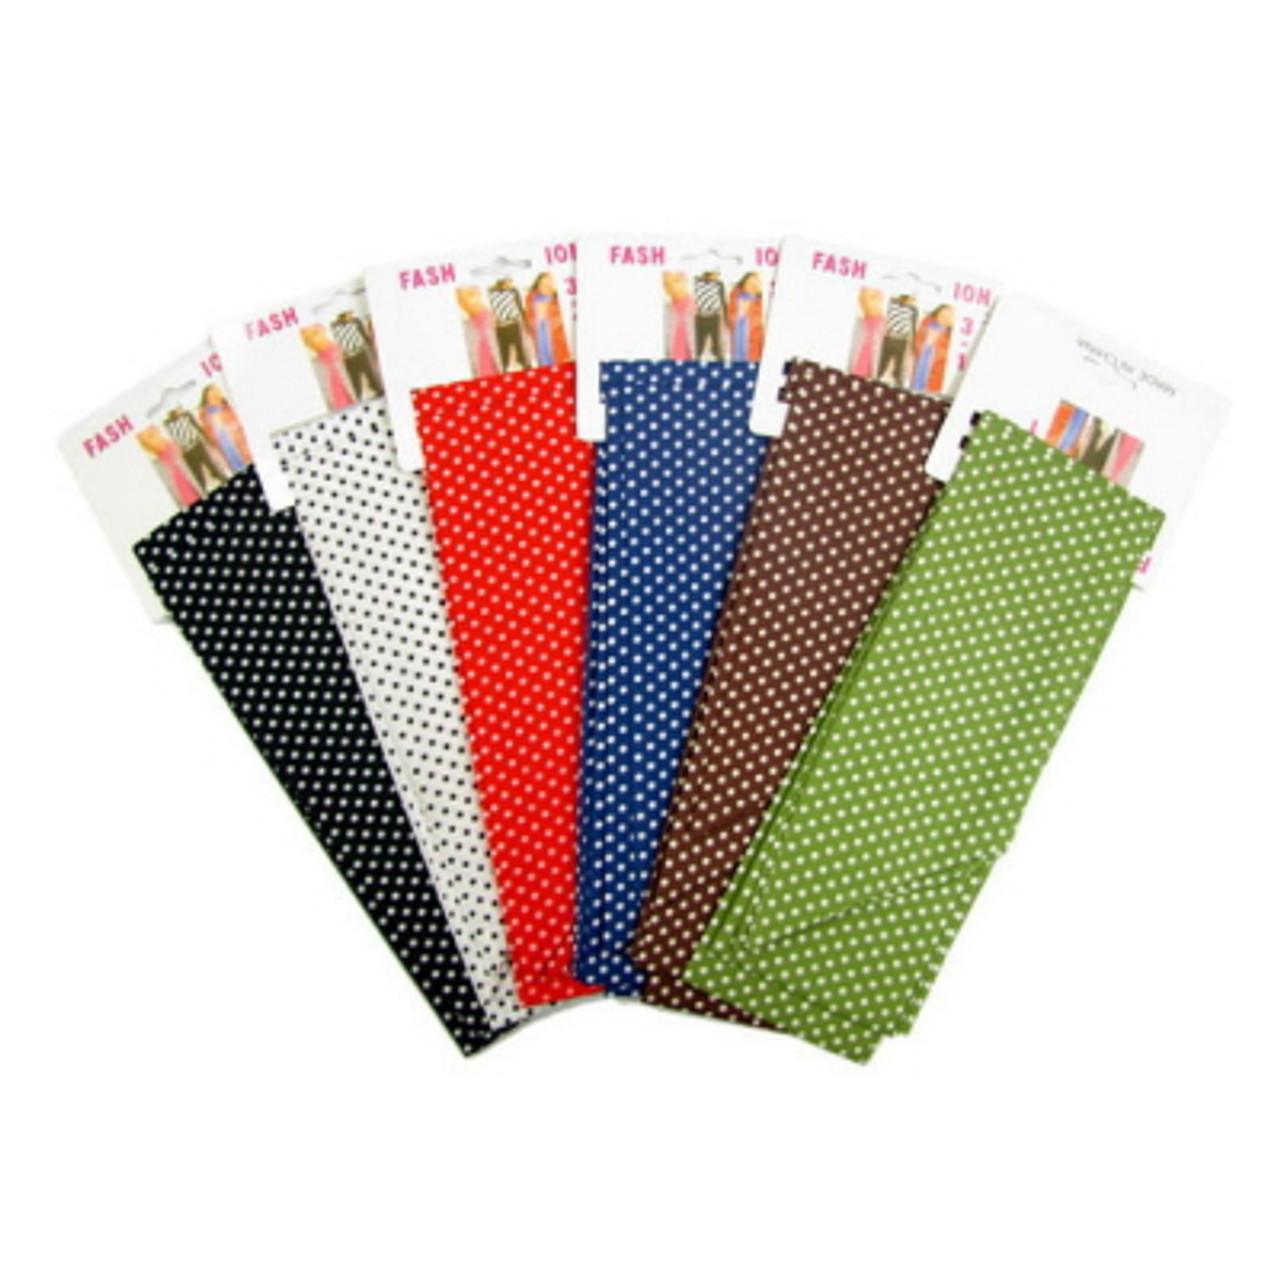 Assorted Color Polka-Dot Print Scarves SCARF66